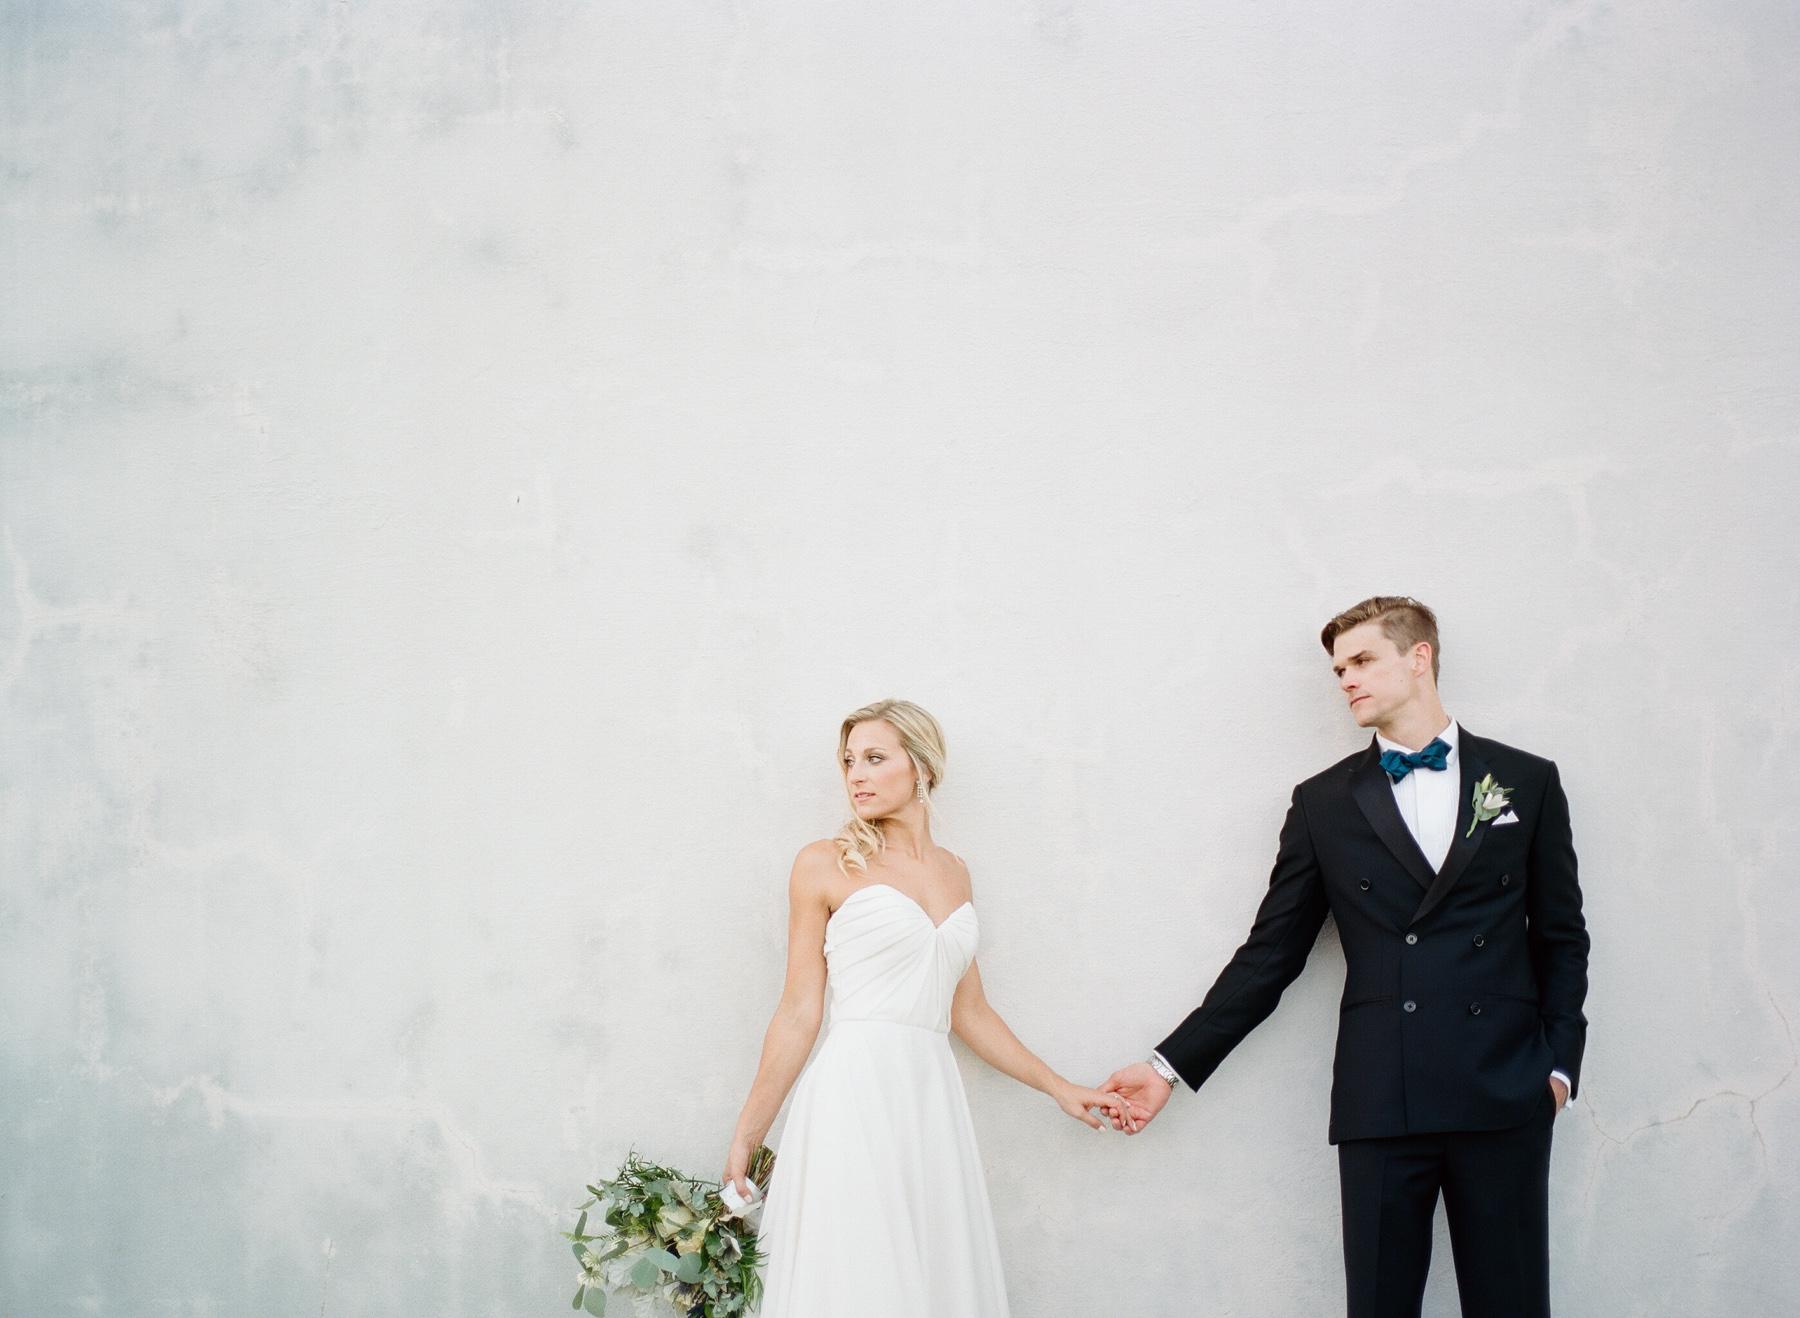 NC-wedding-venues-film-photographer-33.jpg